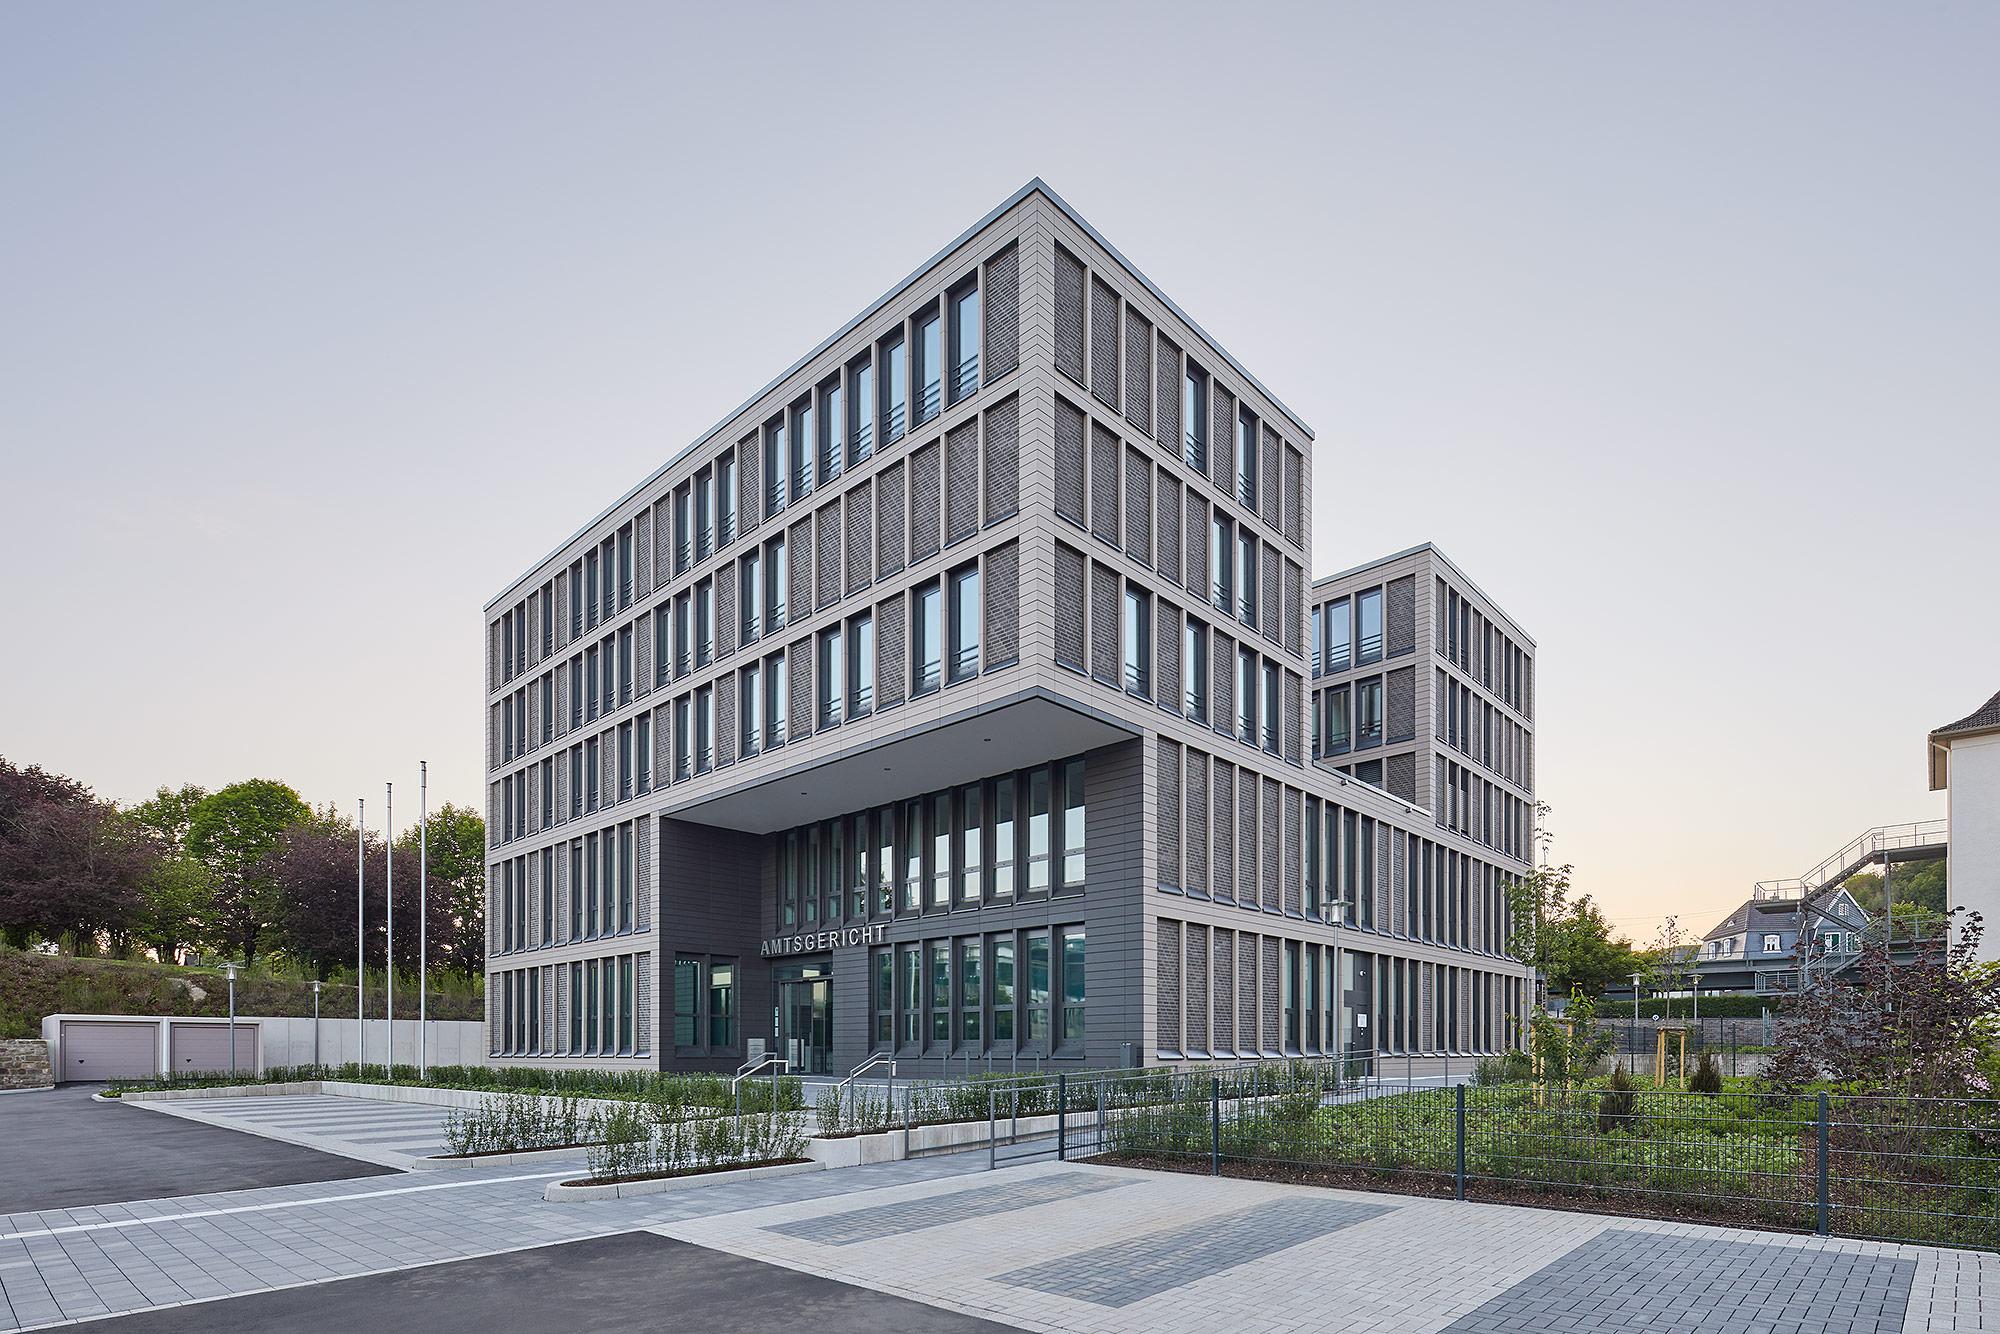 Neubau Amtsgericht Gummersbach @ Philip Kistner